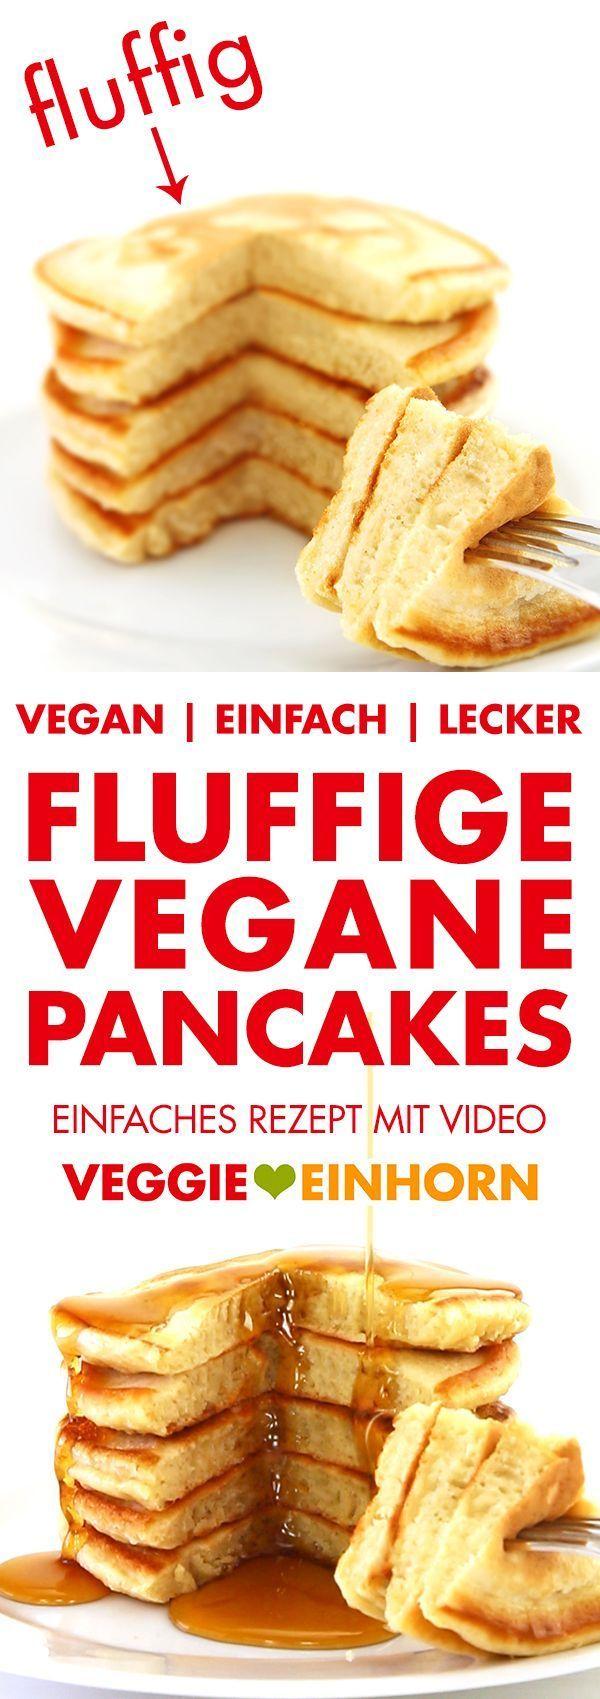 fluffige vegane pancakes leckeres rezept f r vegane. Black Bedroom Furniture Sets. Home Design Ideas